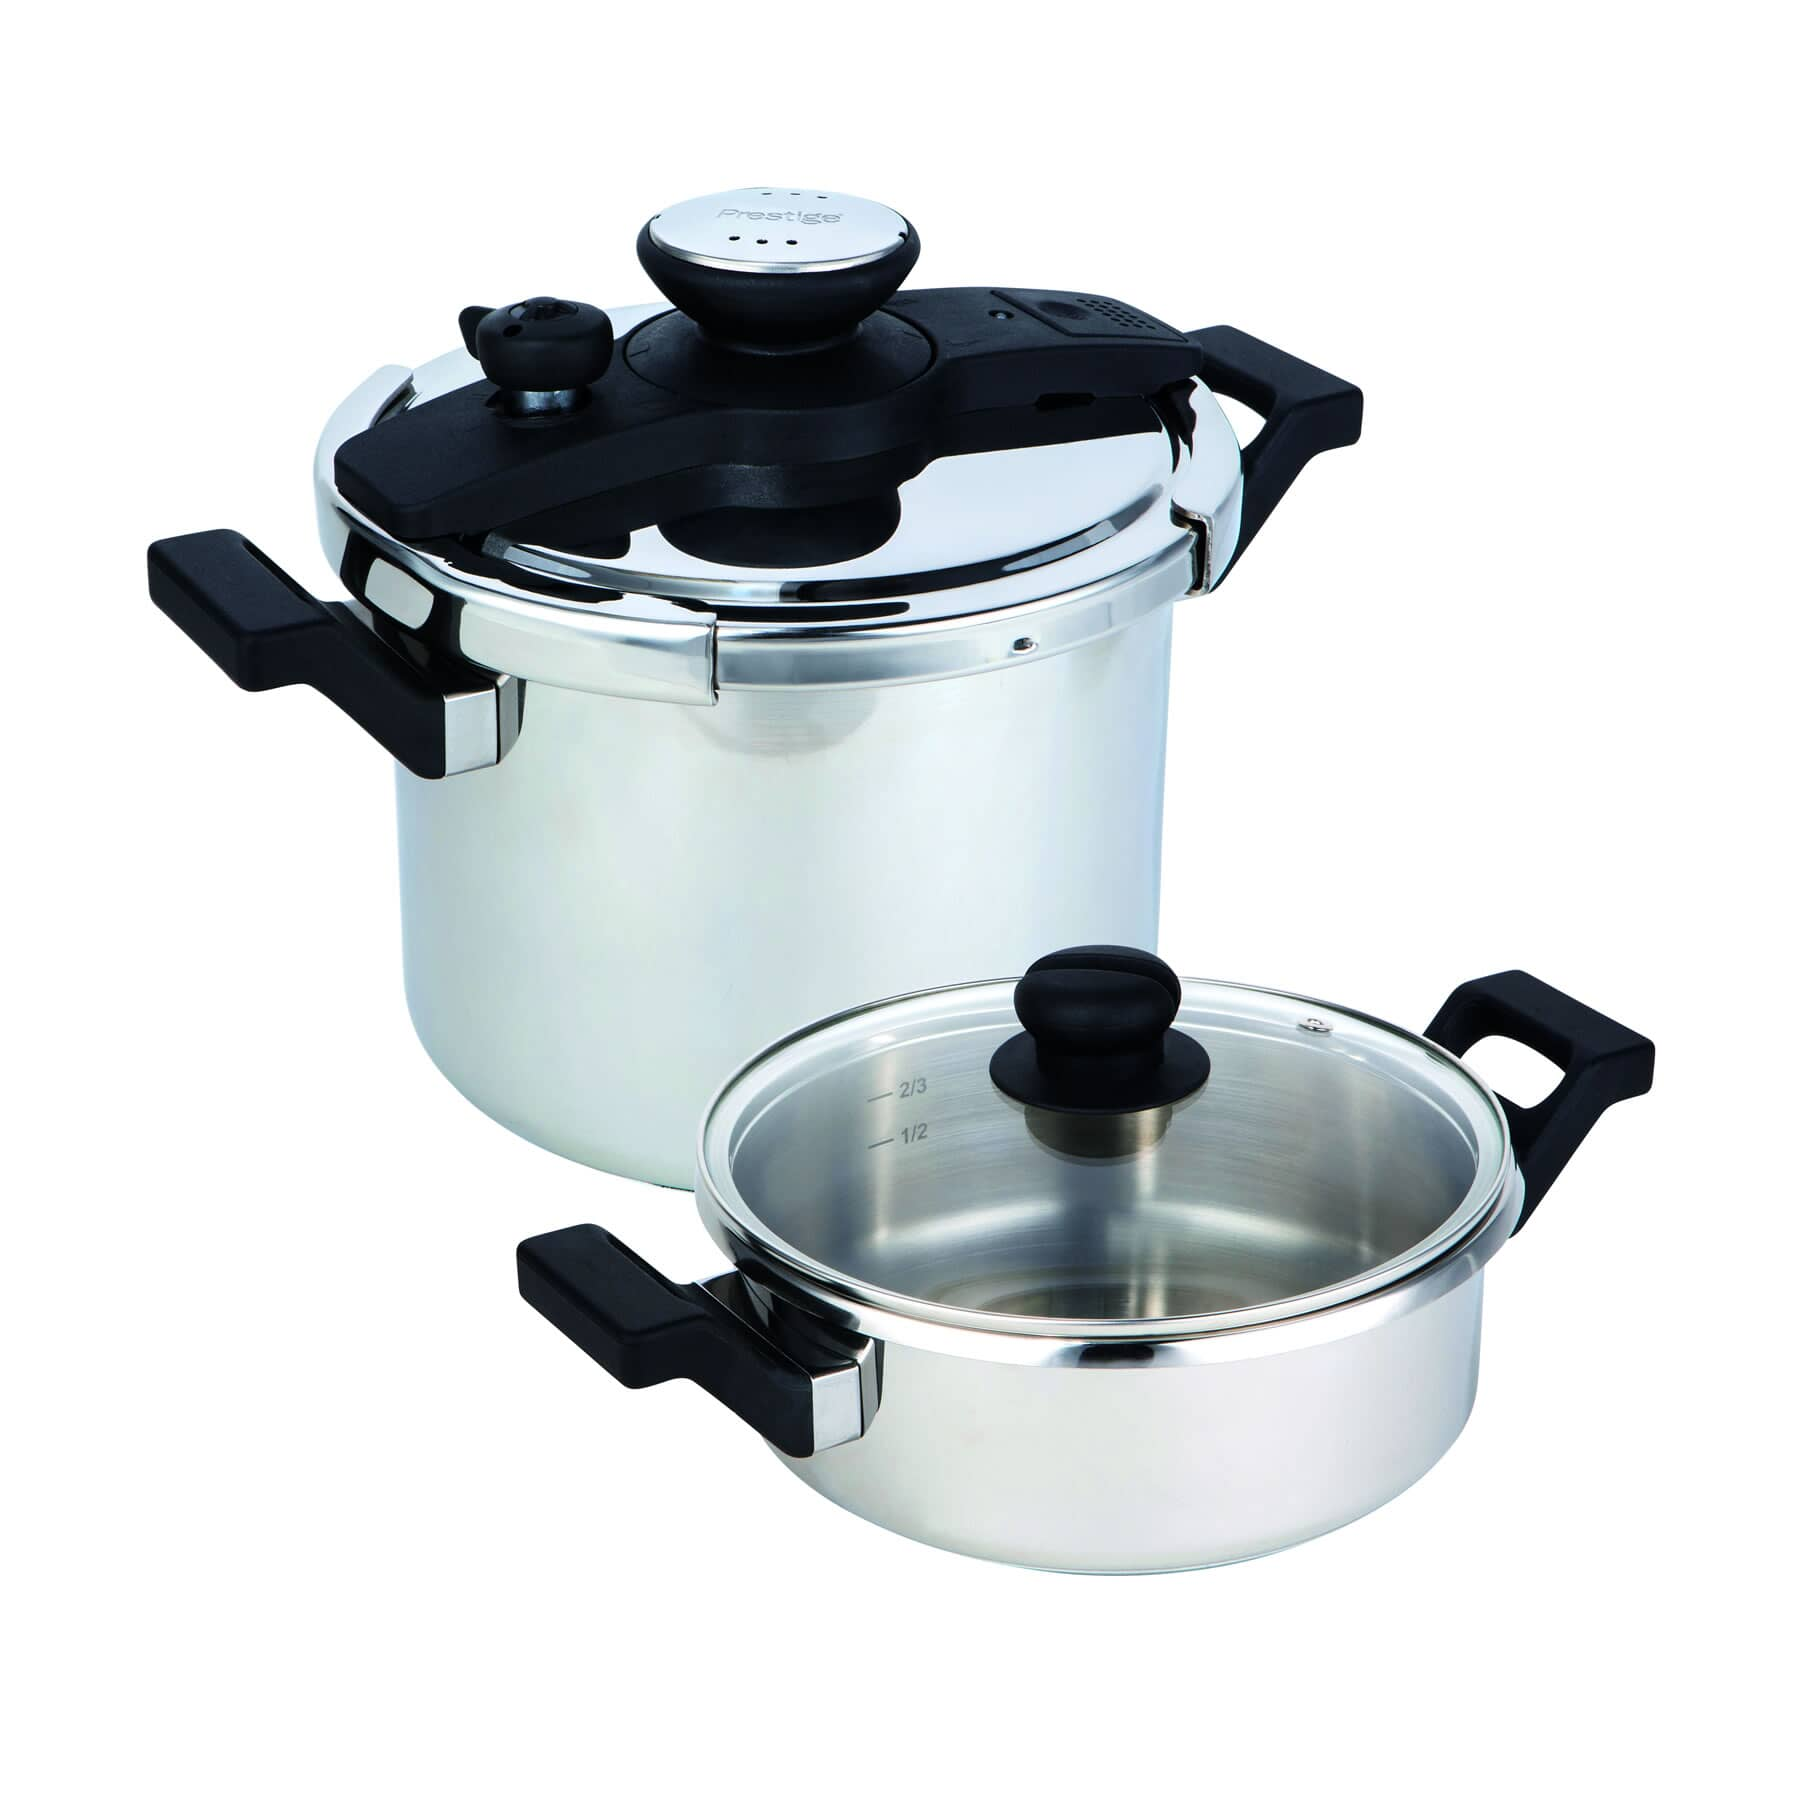 Prestige 4 Piece Stainless Steel Pressure Cooker Set